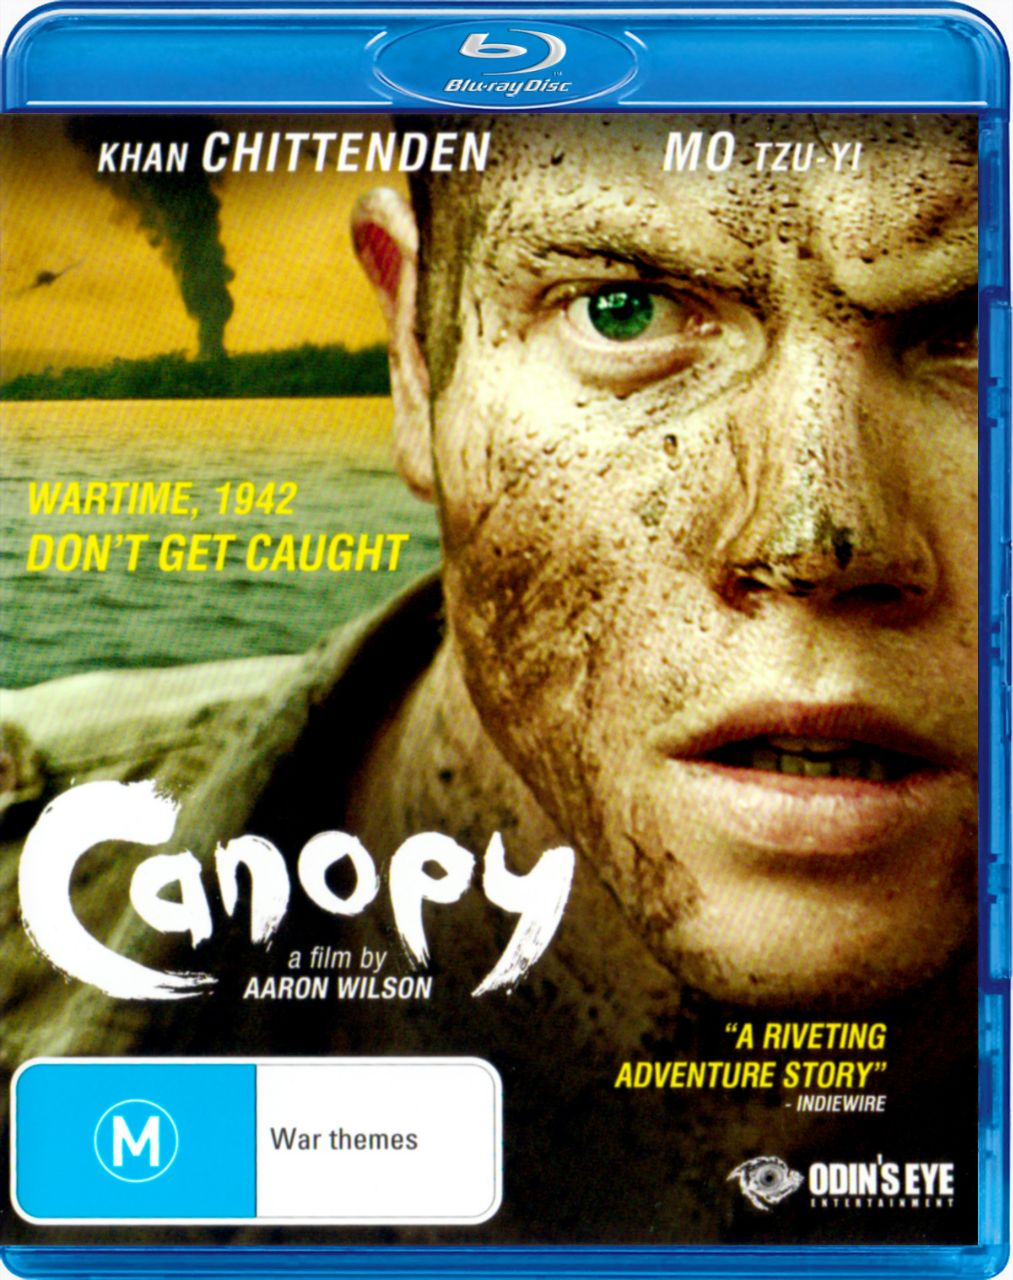 Canopy (2013) 720p HEVC BluRay Hollywood Movie ORG. [Dual Audio] [Hindi or English] x265 AAC ESubs [450MB]